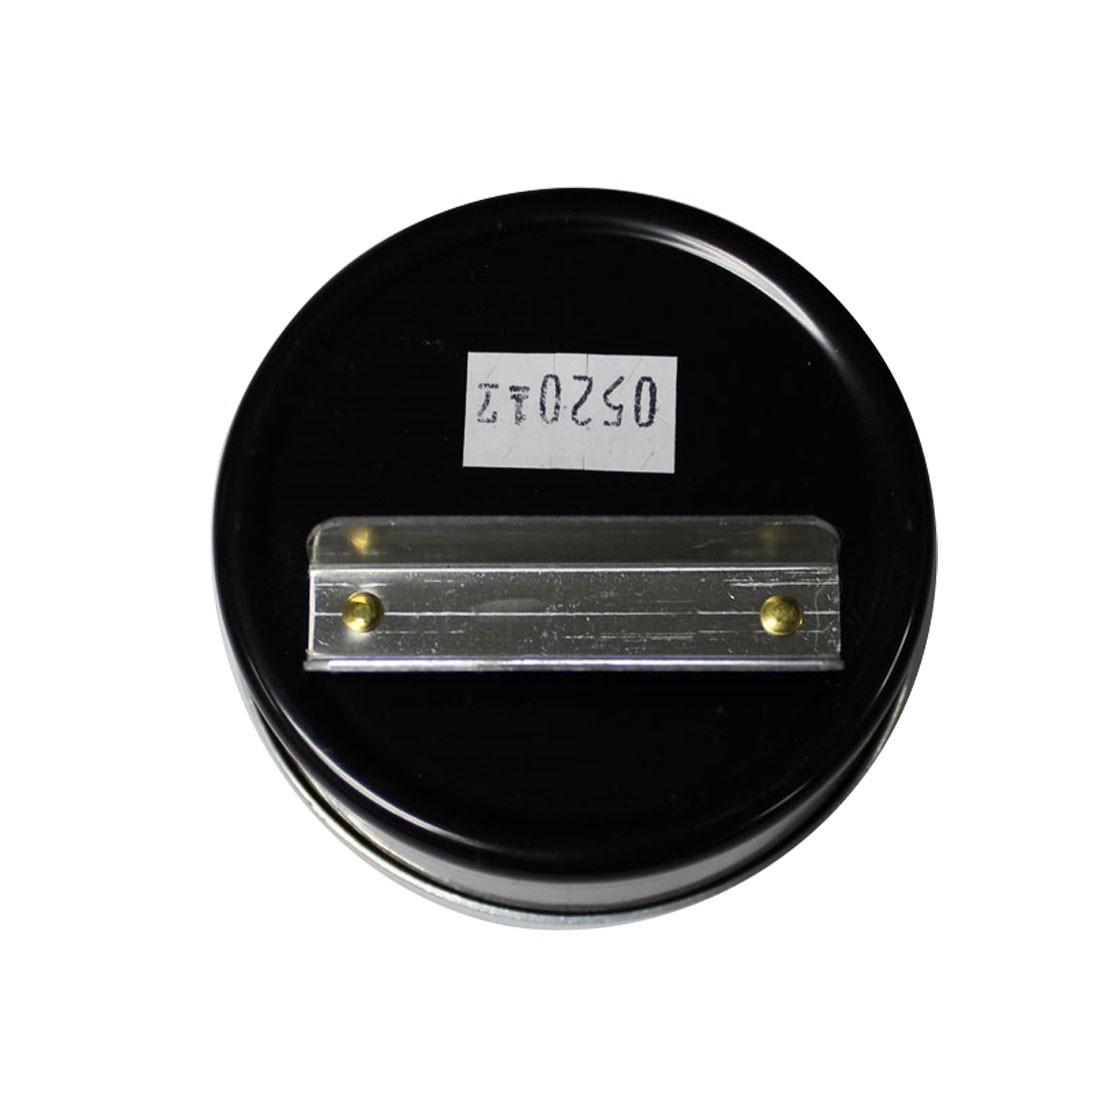 Hoyt 100 Amp Inductive Generator-Alternator Ammeter - Front View